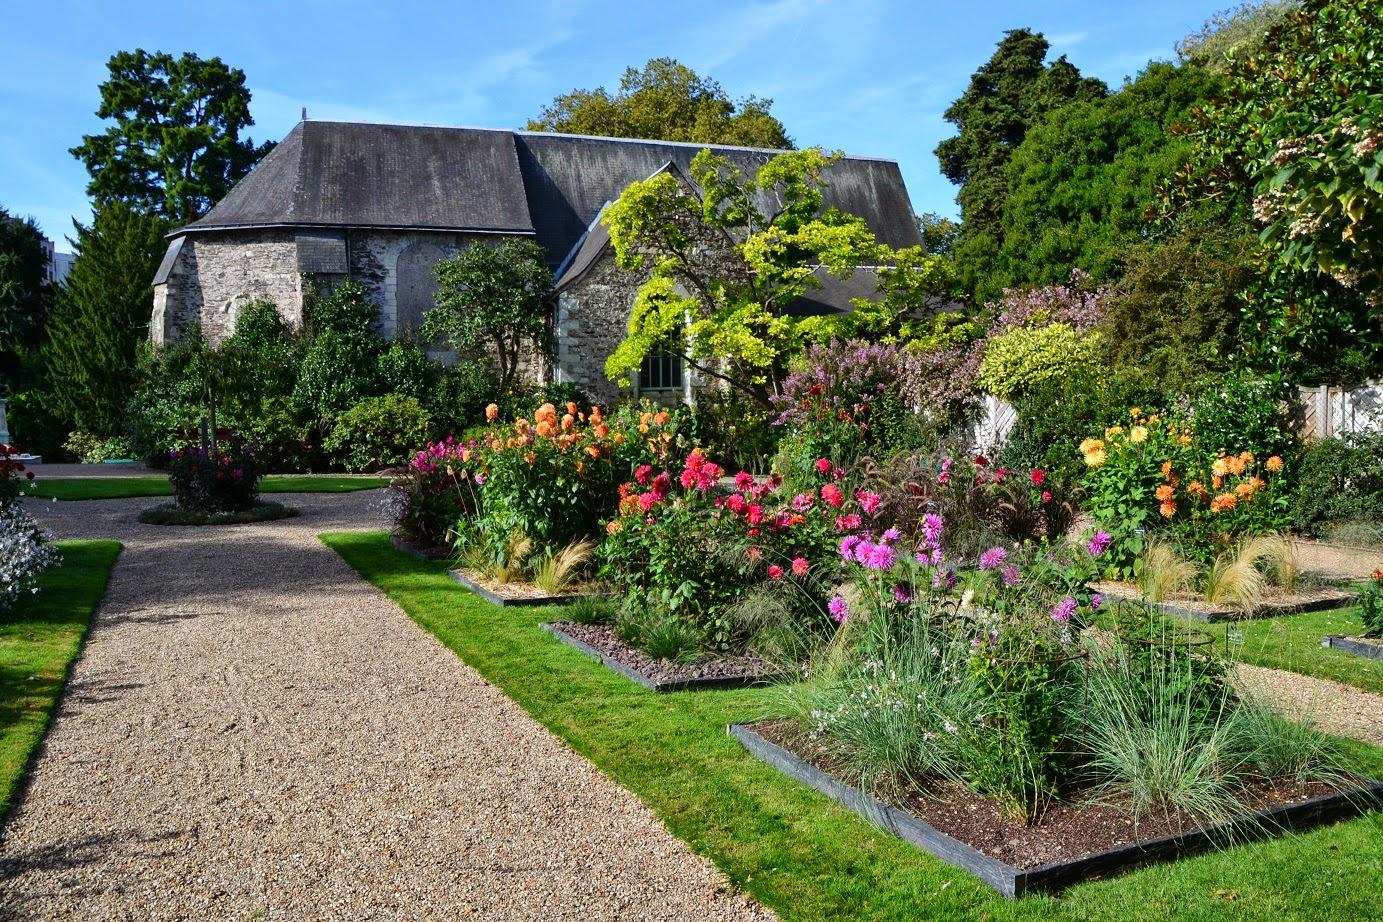 Petit jardin mosellan by caro jardin des plantes d 39 angers - Petit jardin image angers ...